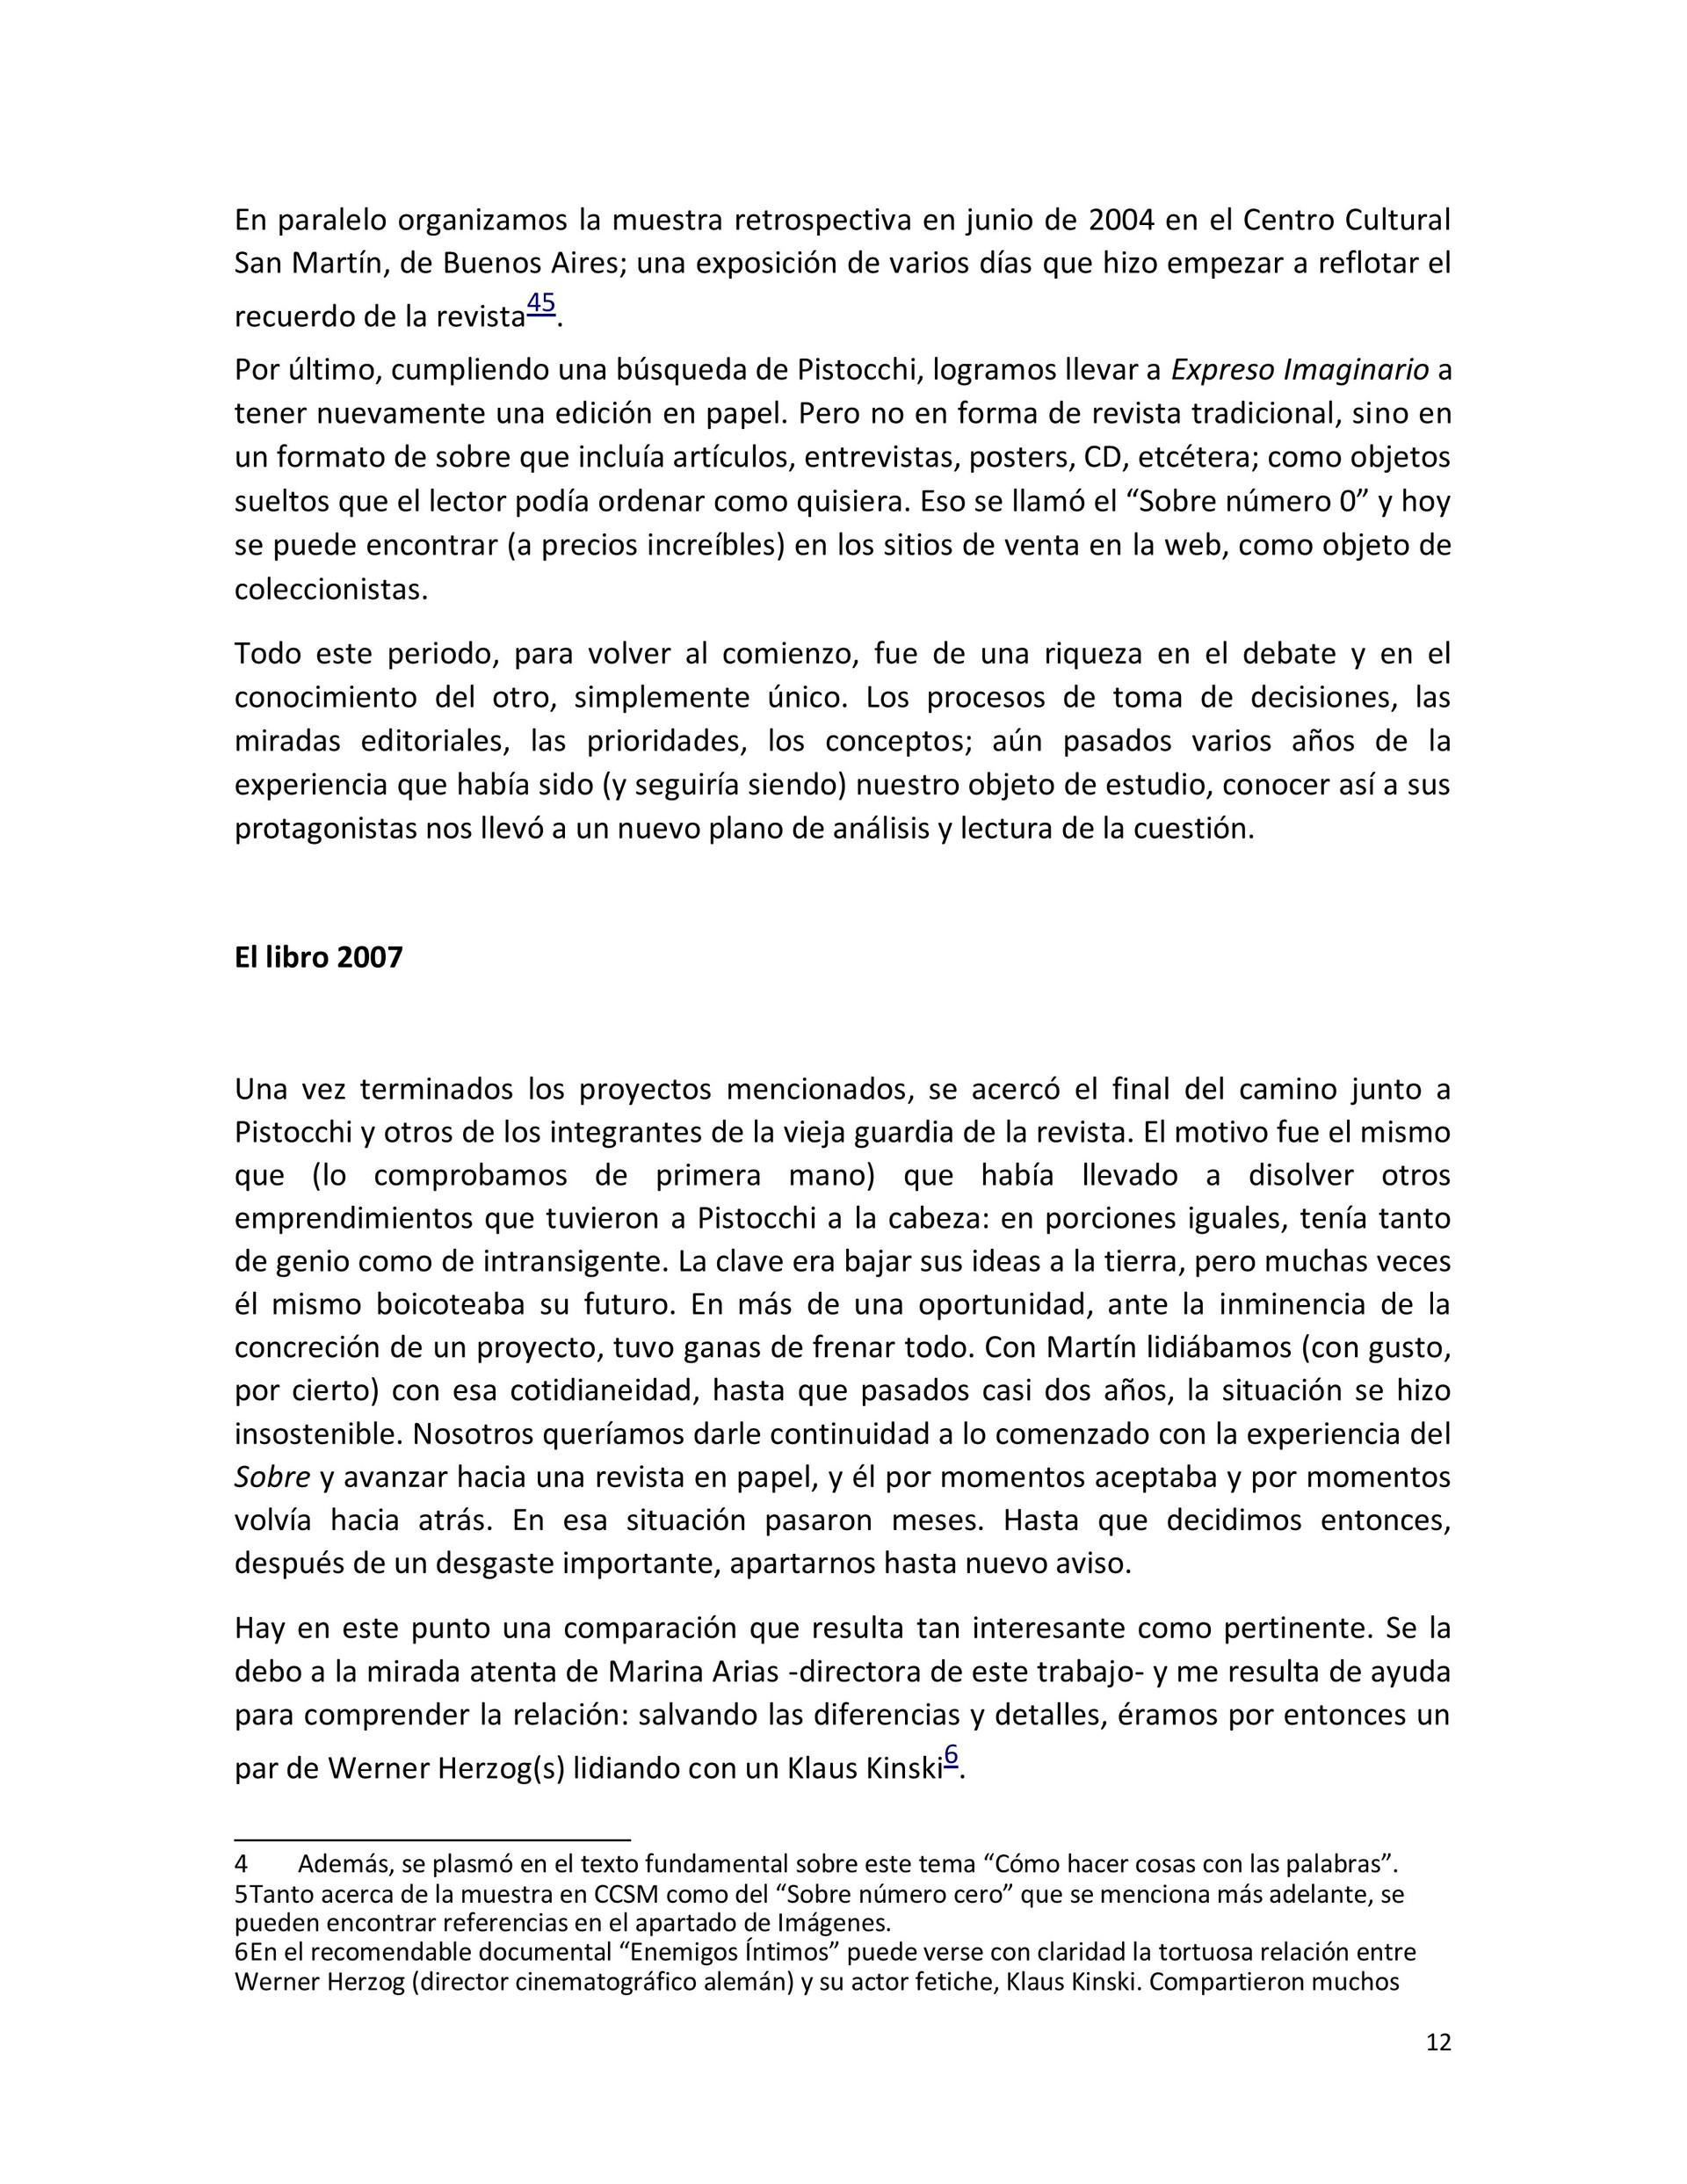 estacion_Page_11.jpeg